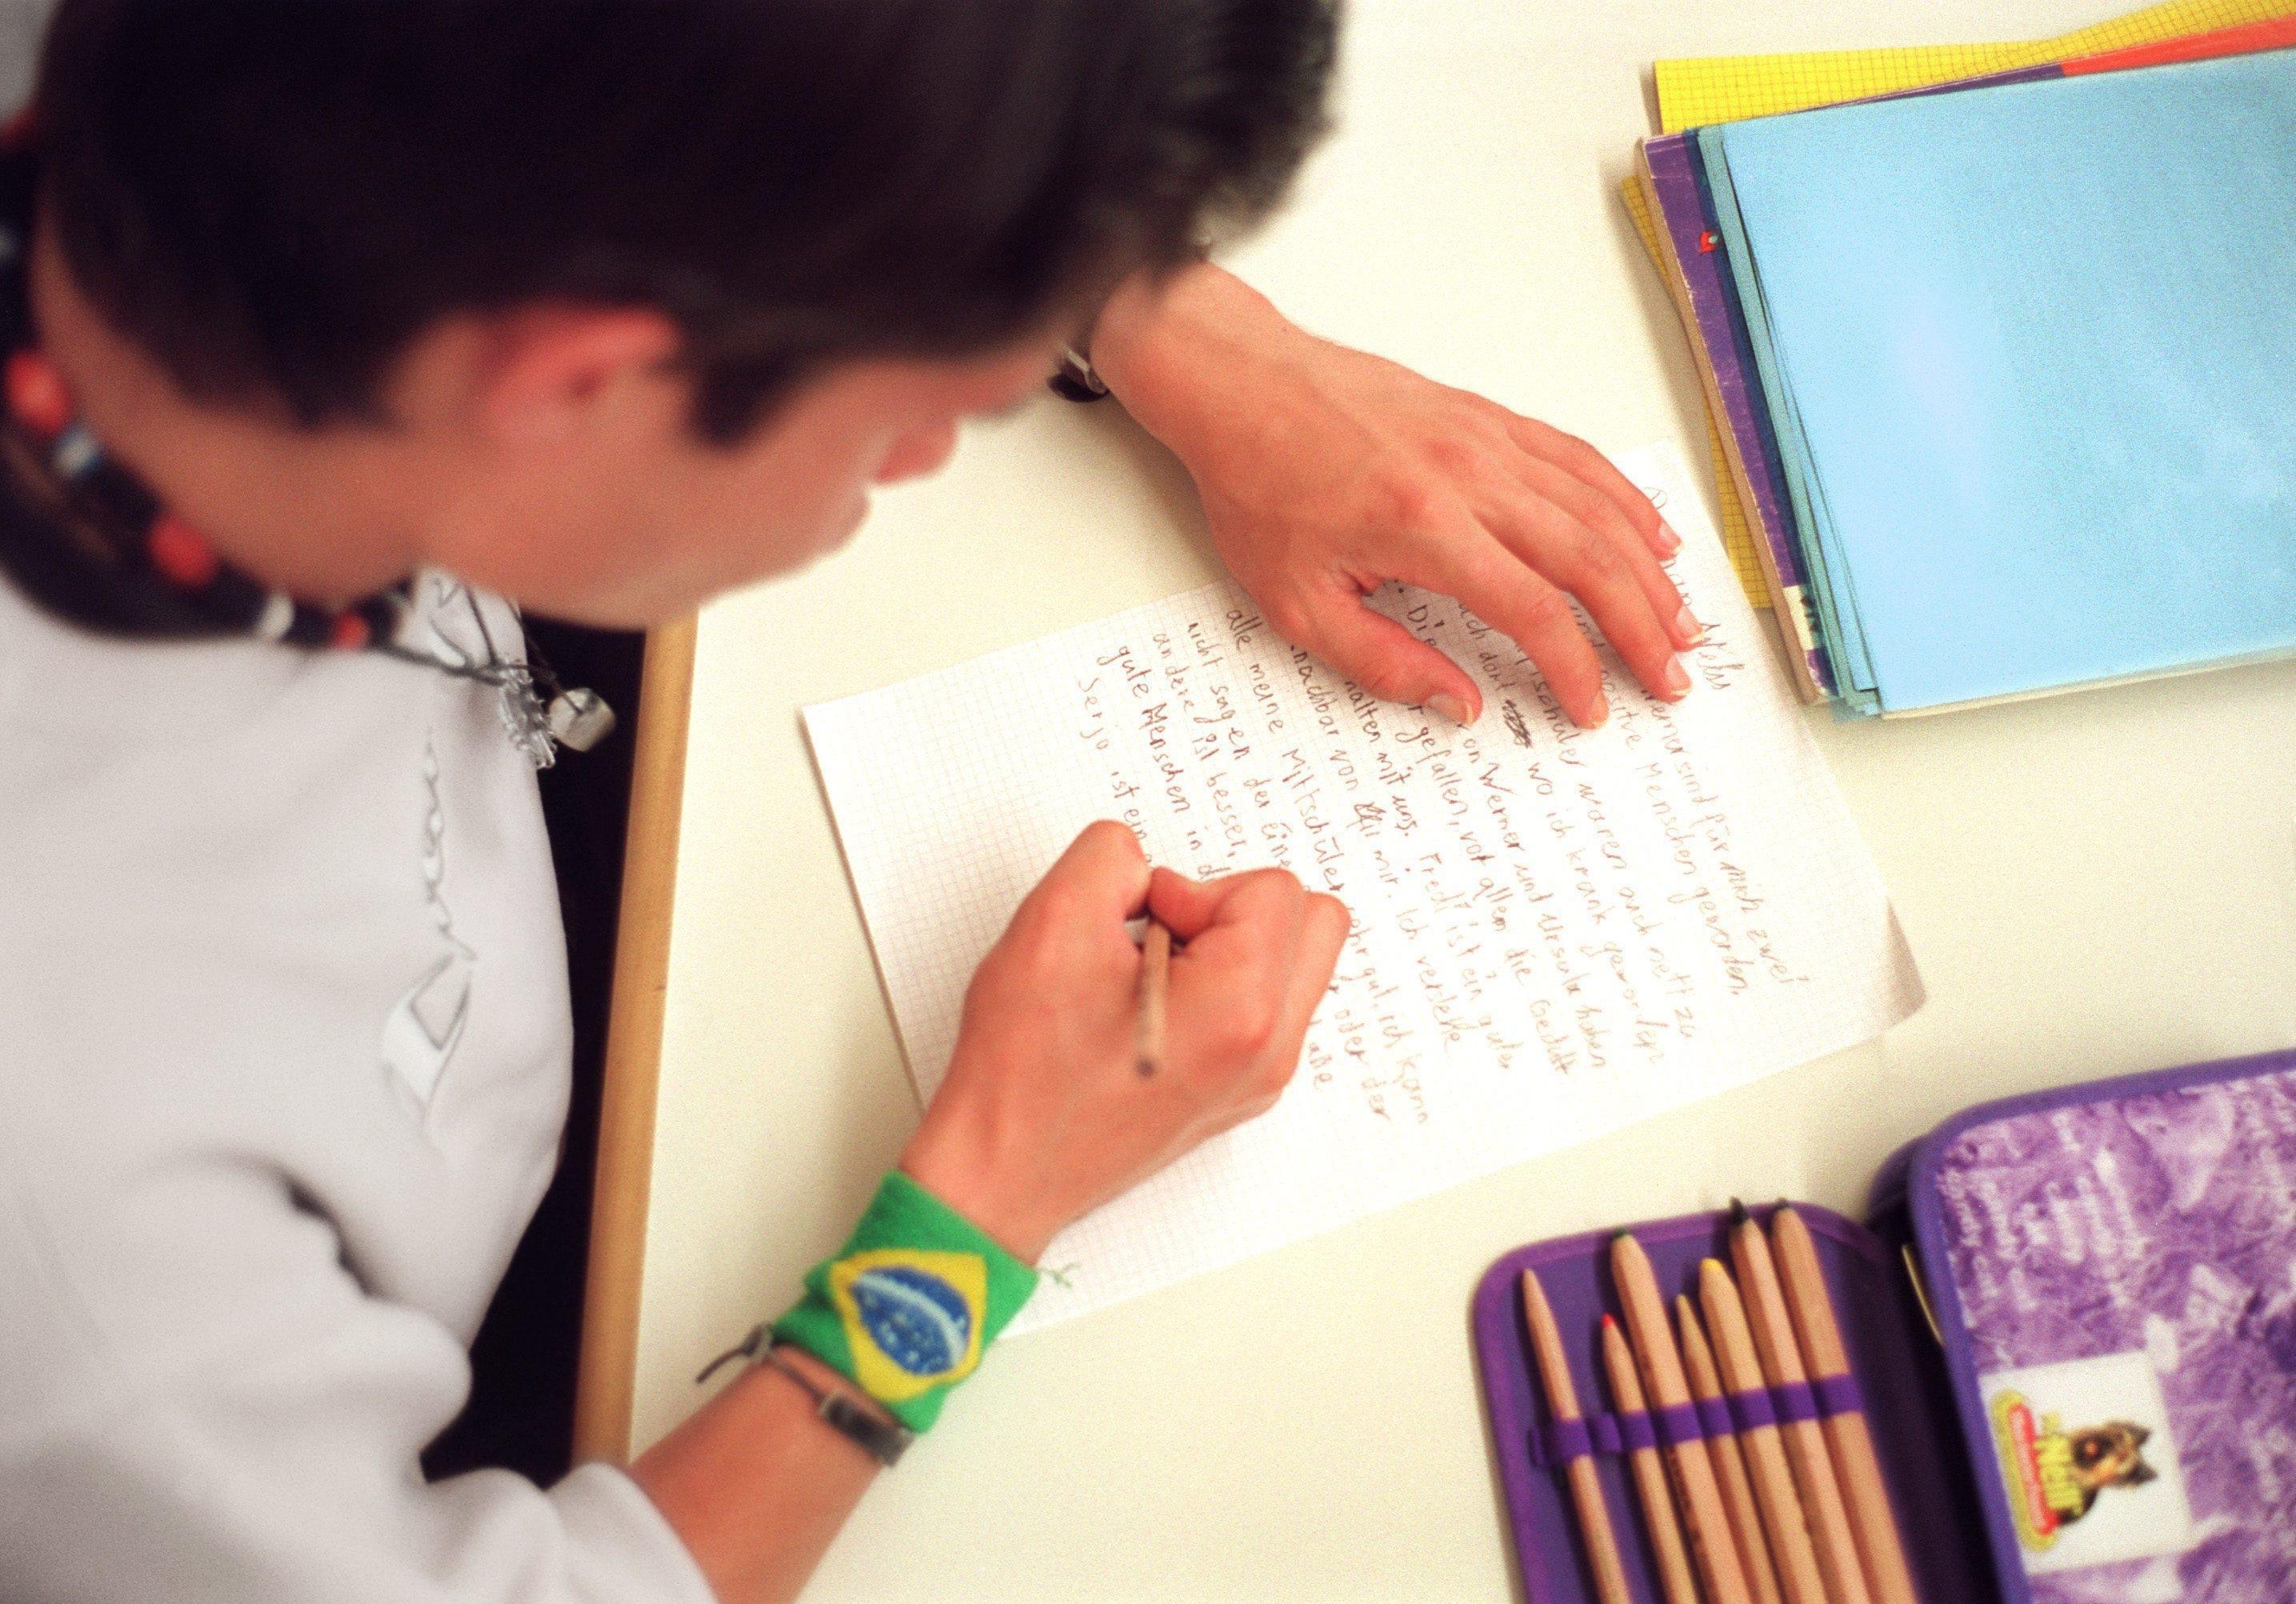 In scolar scriva in text en scola.